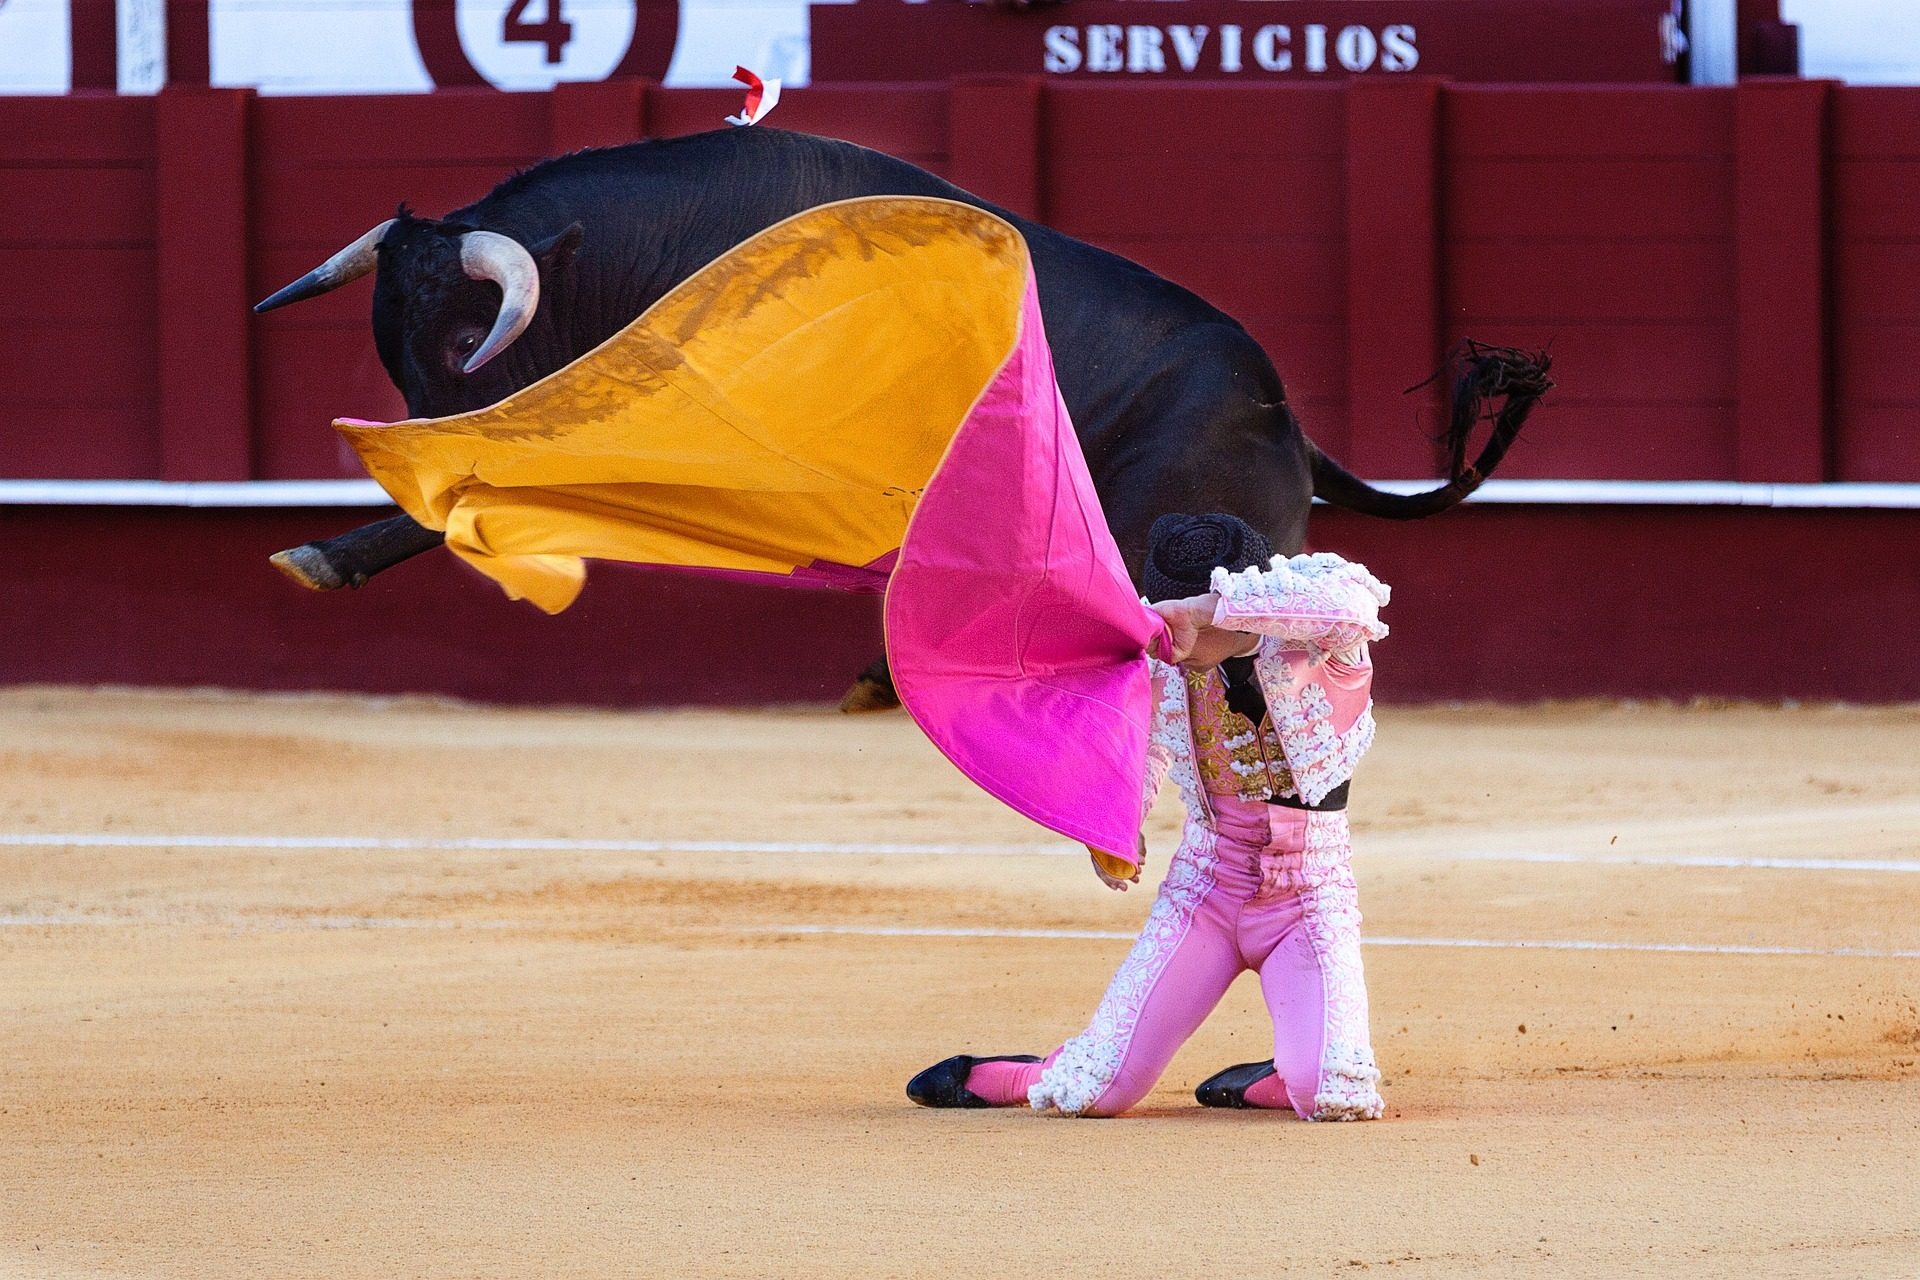 corrida, टोरो, torero, उत्सव, कॉस्टयूम, रोशनी, स्पेन - HD वॉलपेपर - प्रोफेसर-falken.com